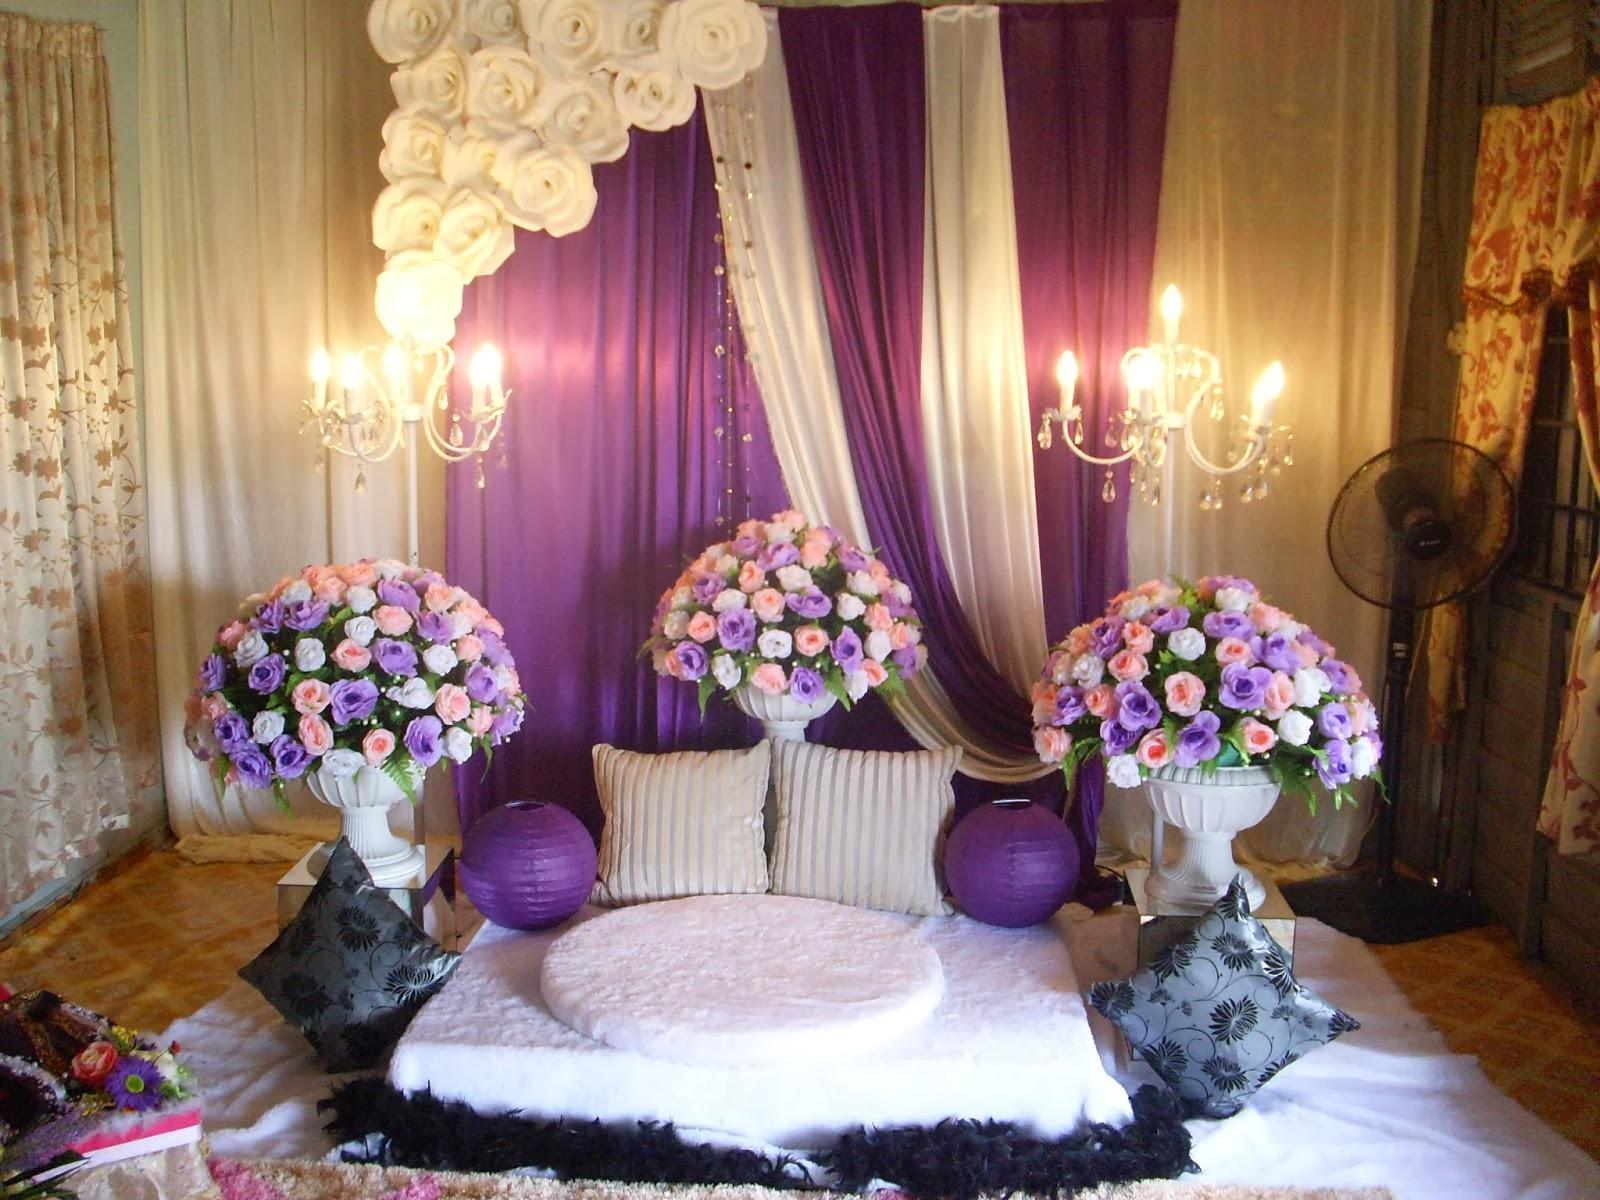 Melayu baru nikah - 2 1